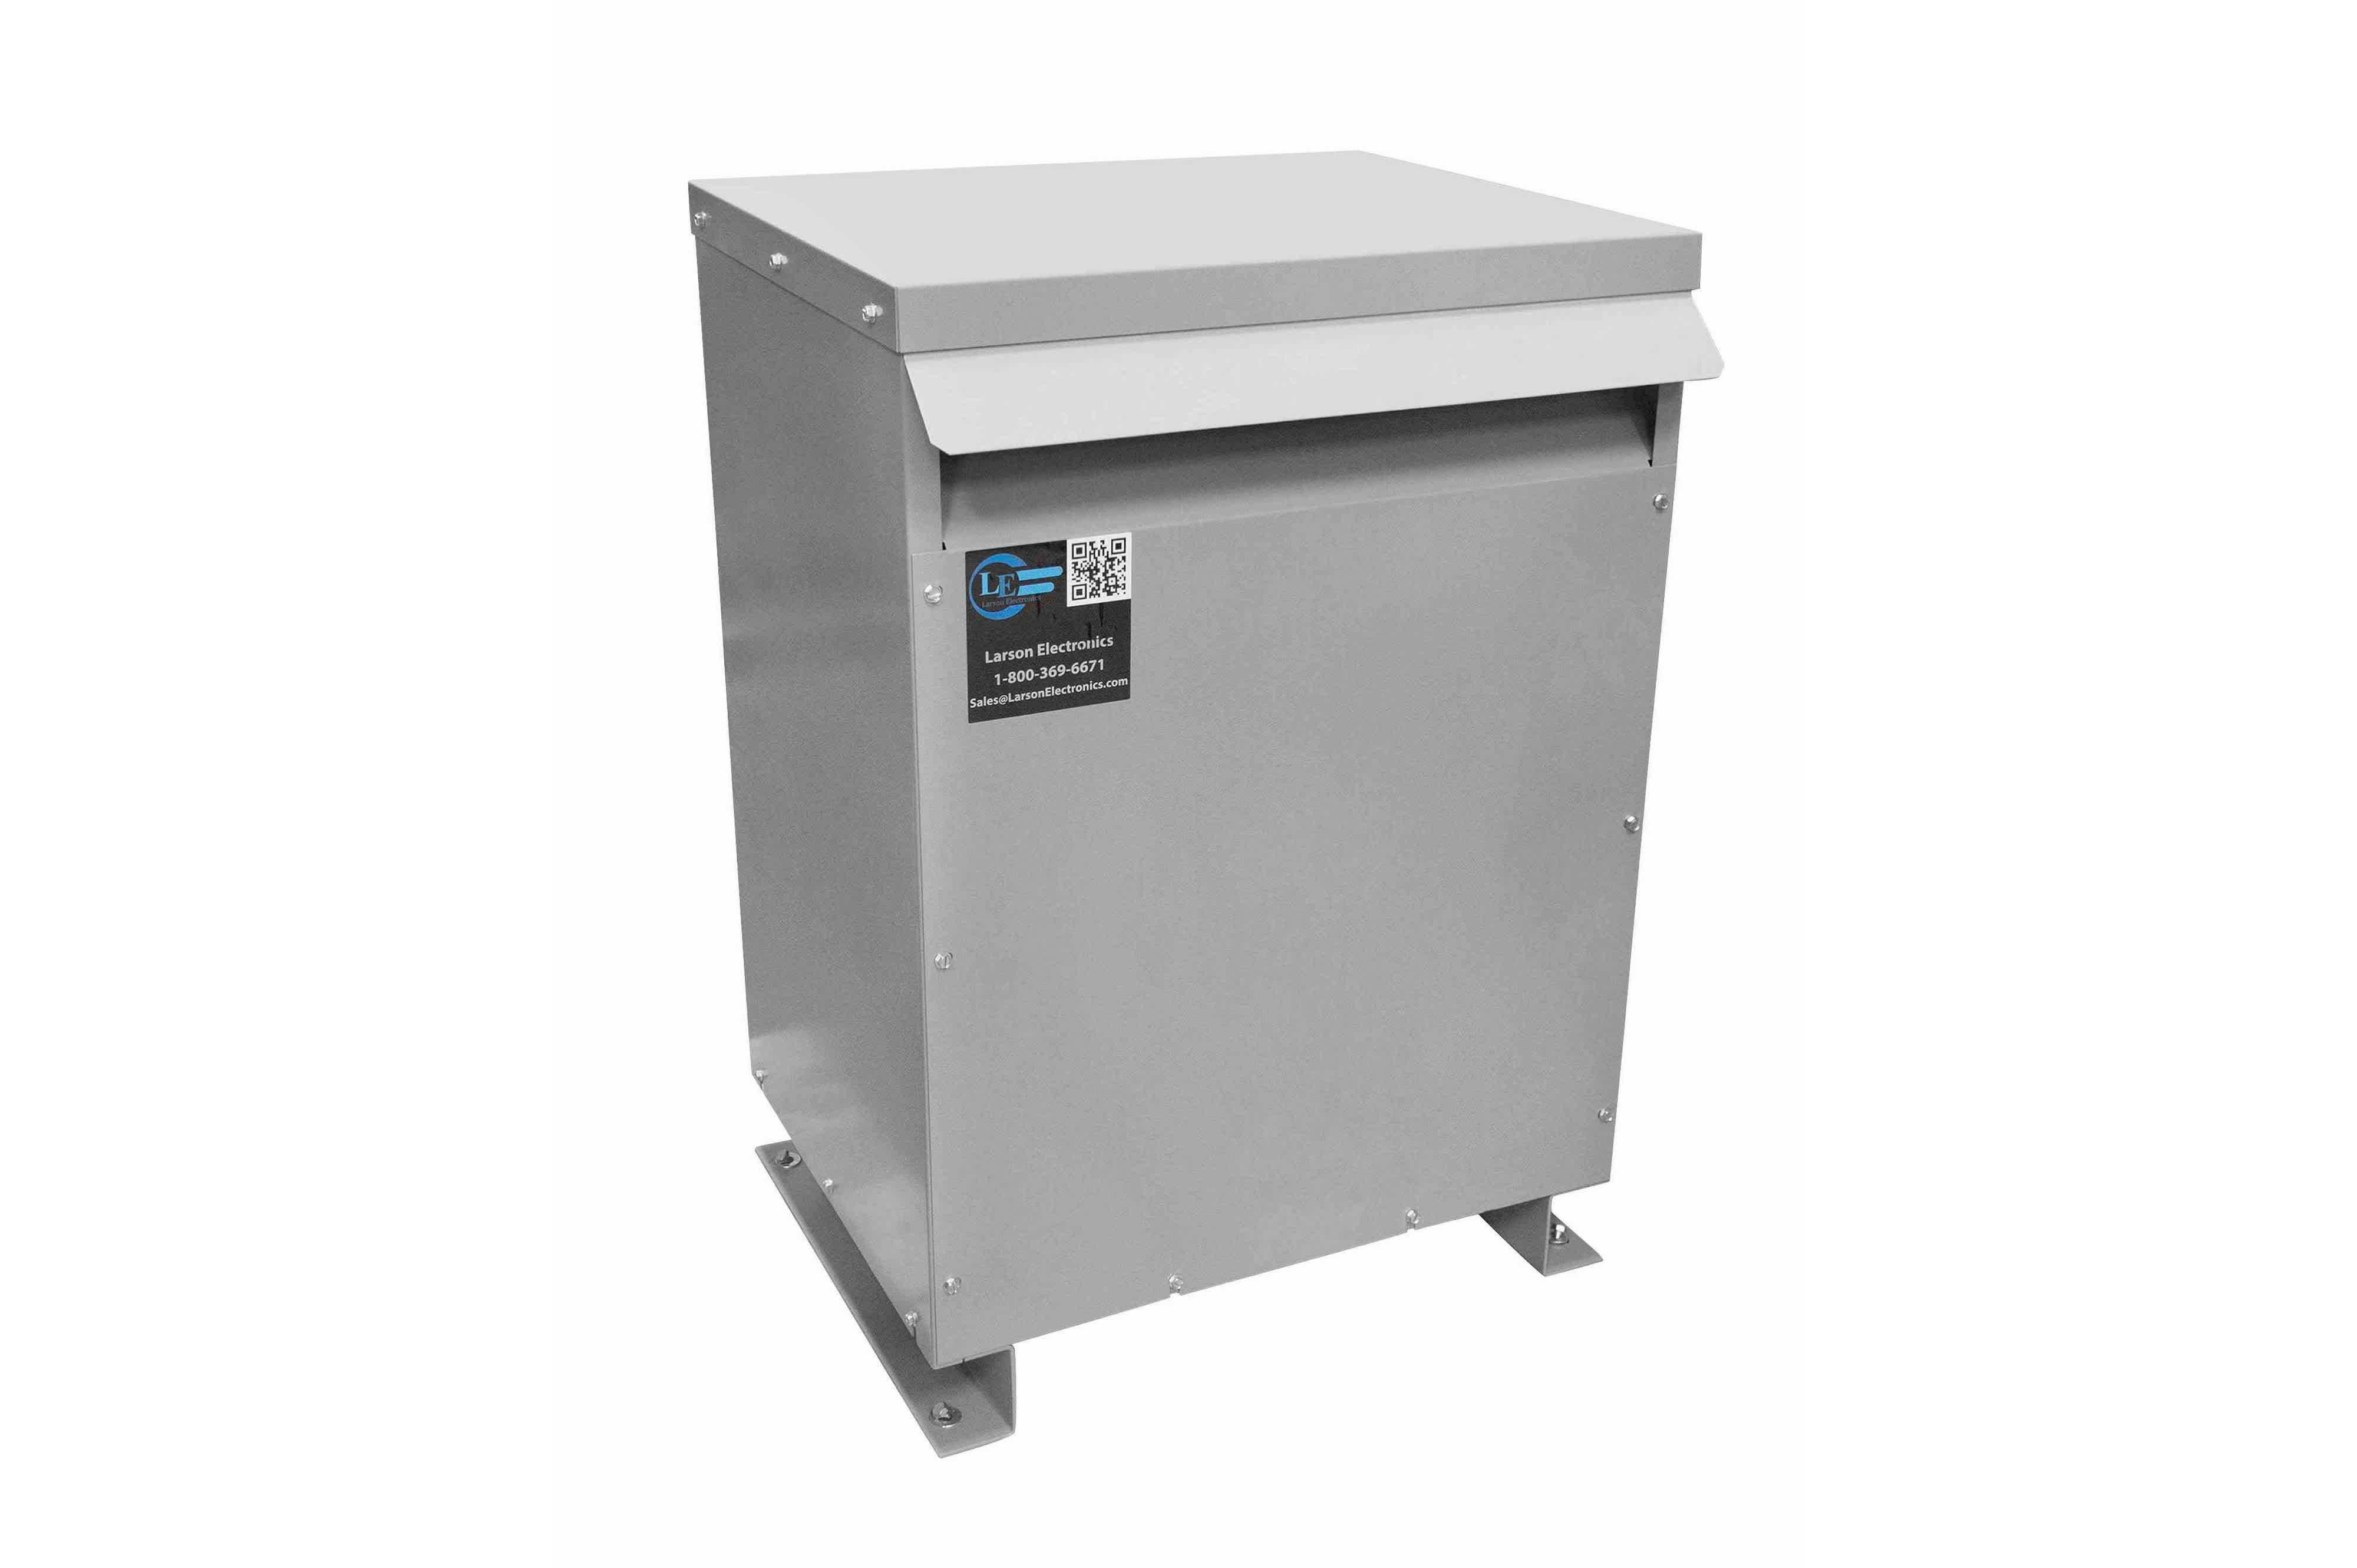 12 kVA 3PH Isolation Transformer, 460V Wye Primary, 600Y/347 Wye-N Secondary, N3R, Ventilated, 60 Hz